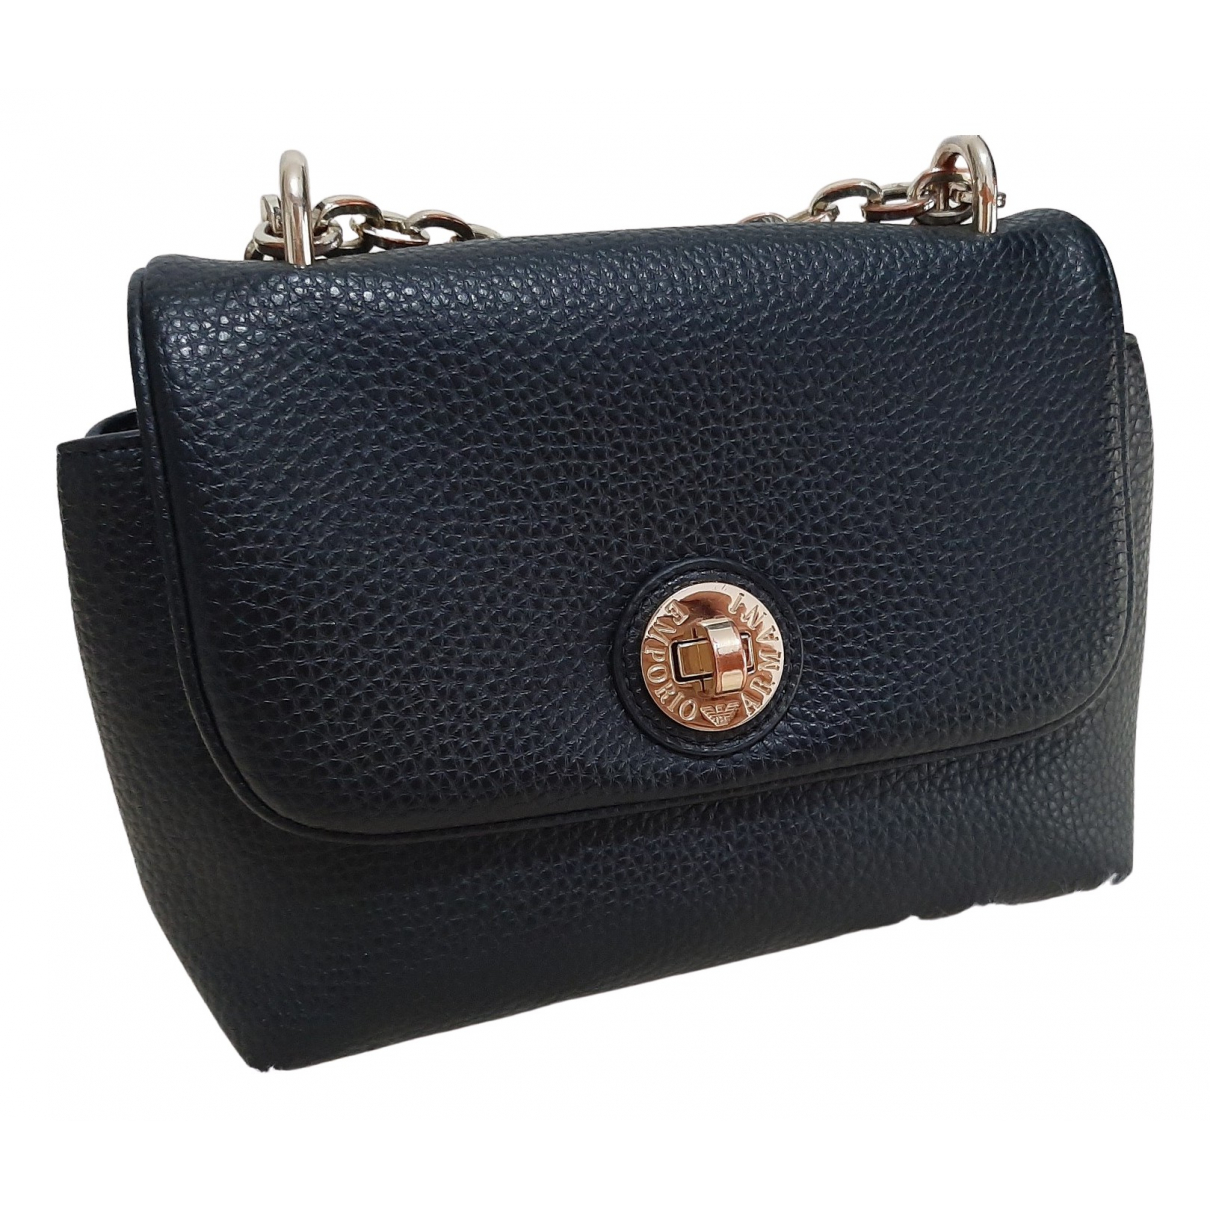 Emporio Armani N Black Leather handbag for Women N